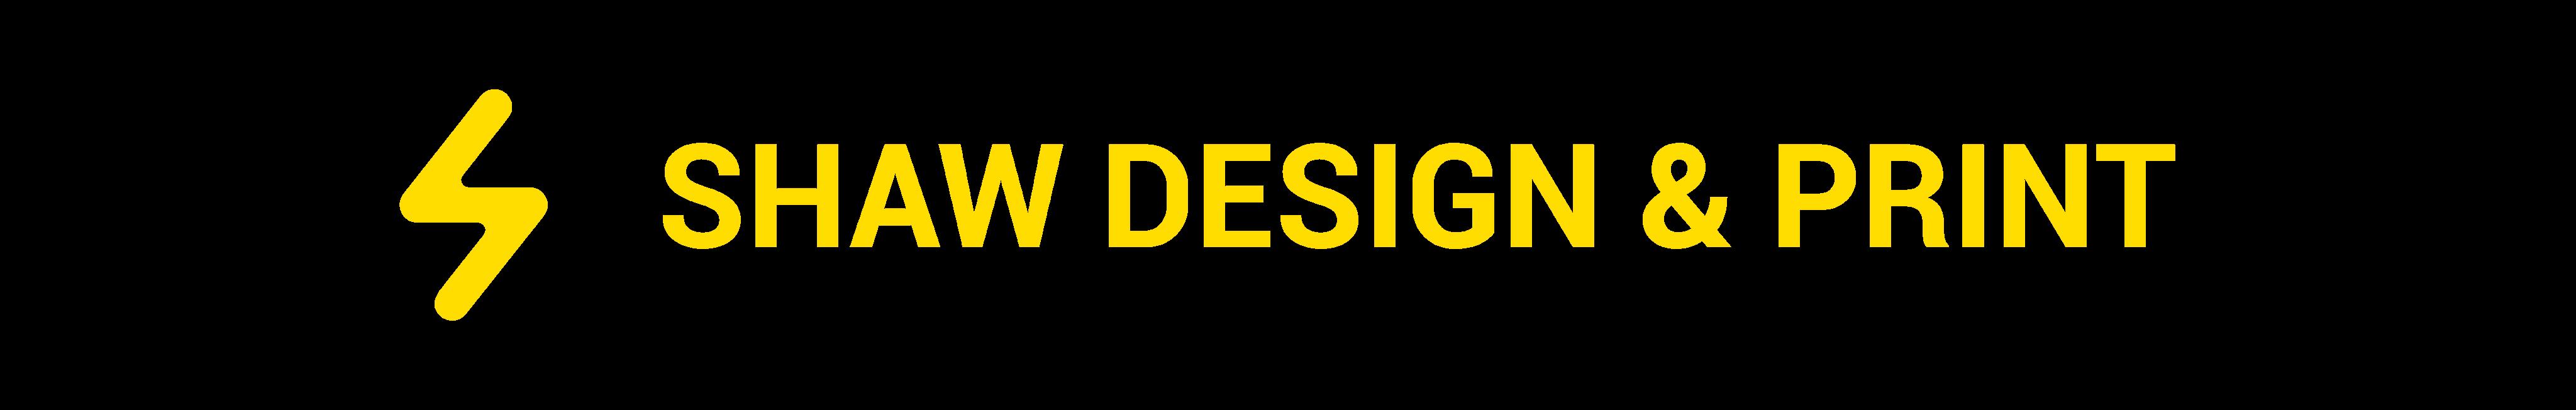 Shaw Design & Print